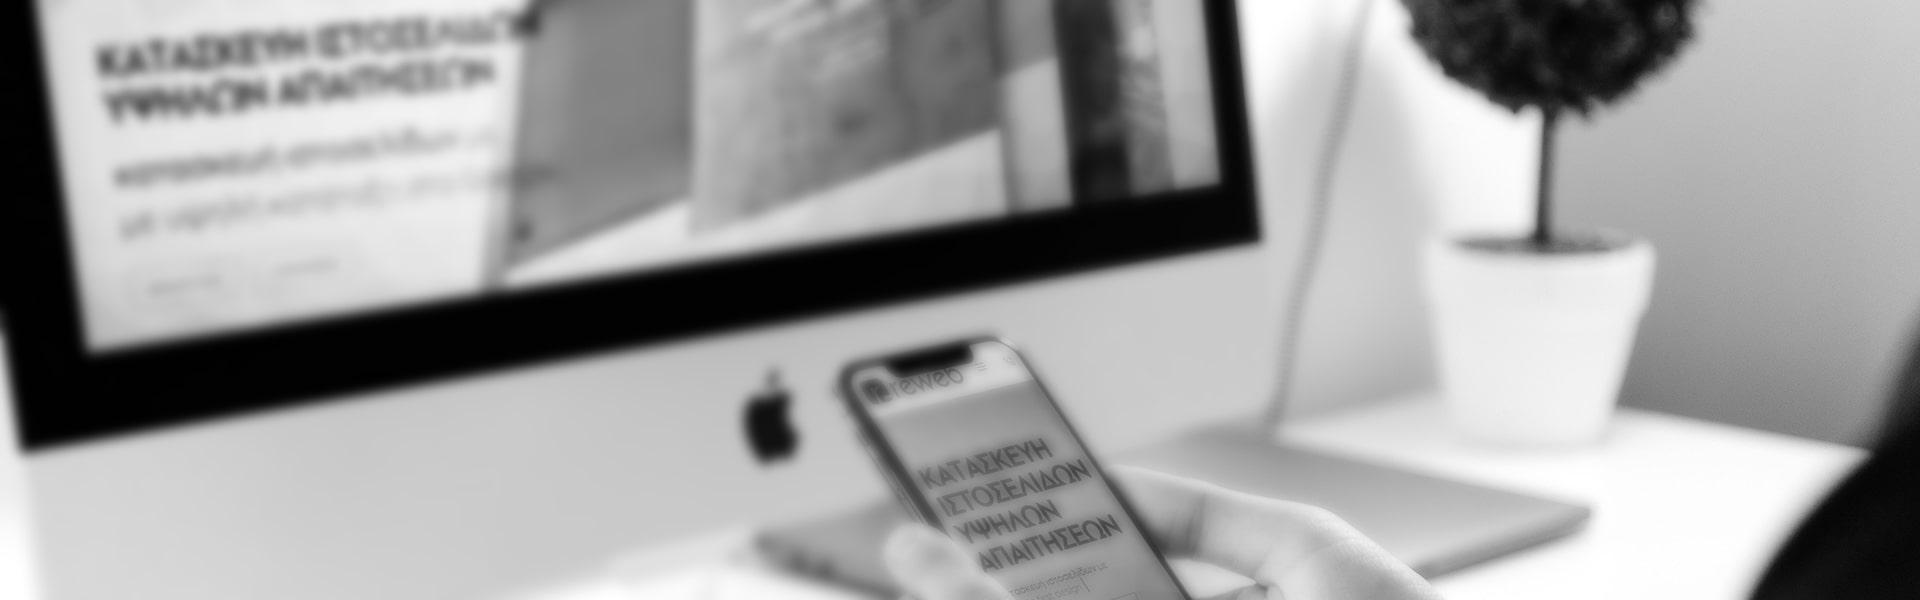 background μετατροπή ιστοσελίδας σε responsive